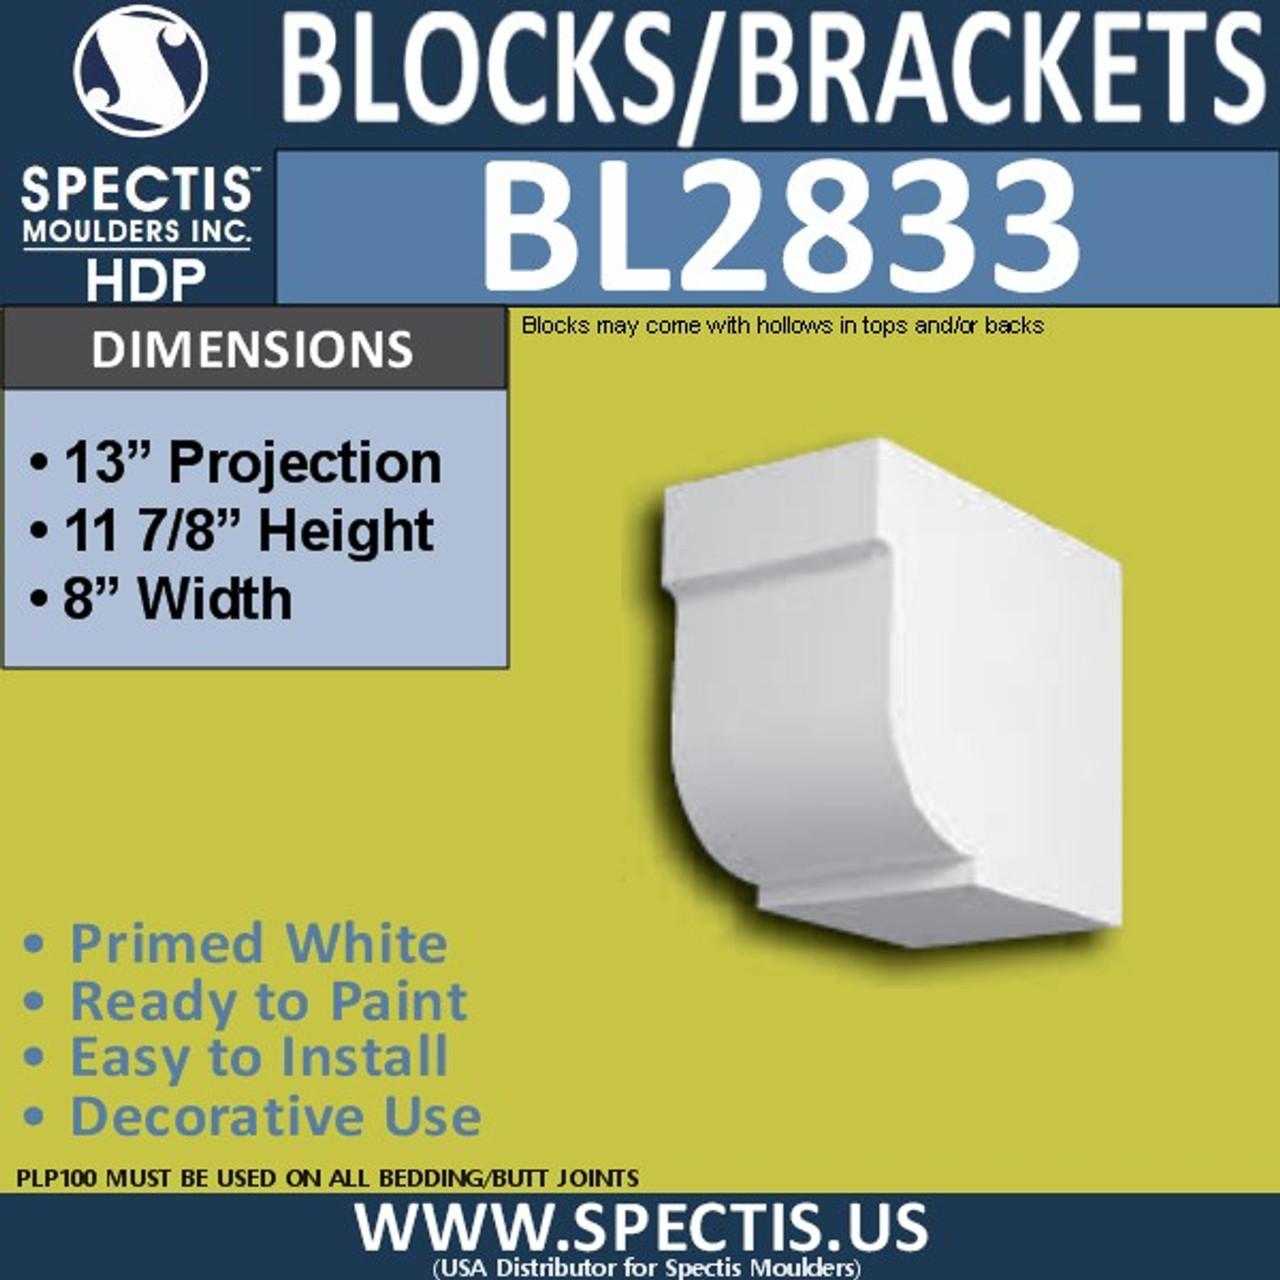 "BL2833 Eave Block or Bracket 8""W x 11.9""H x 13"" P"